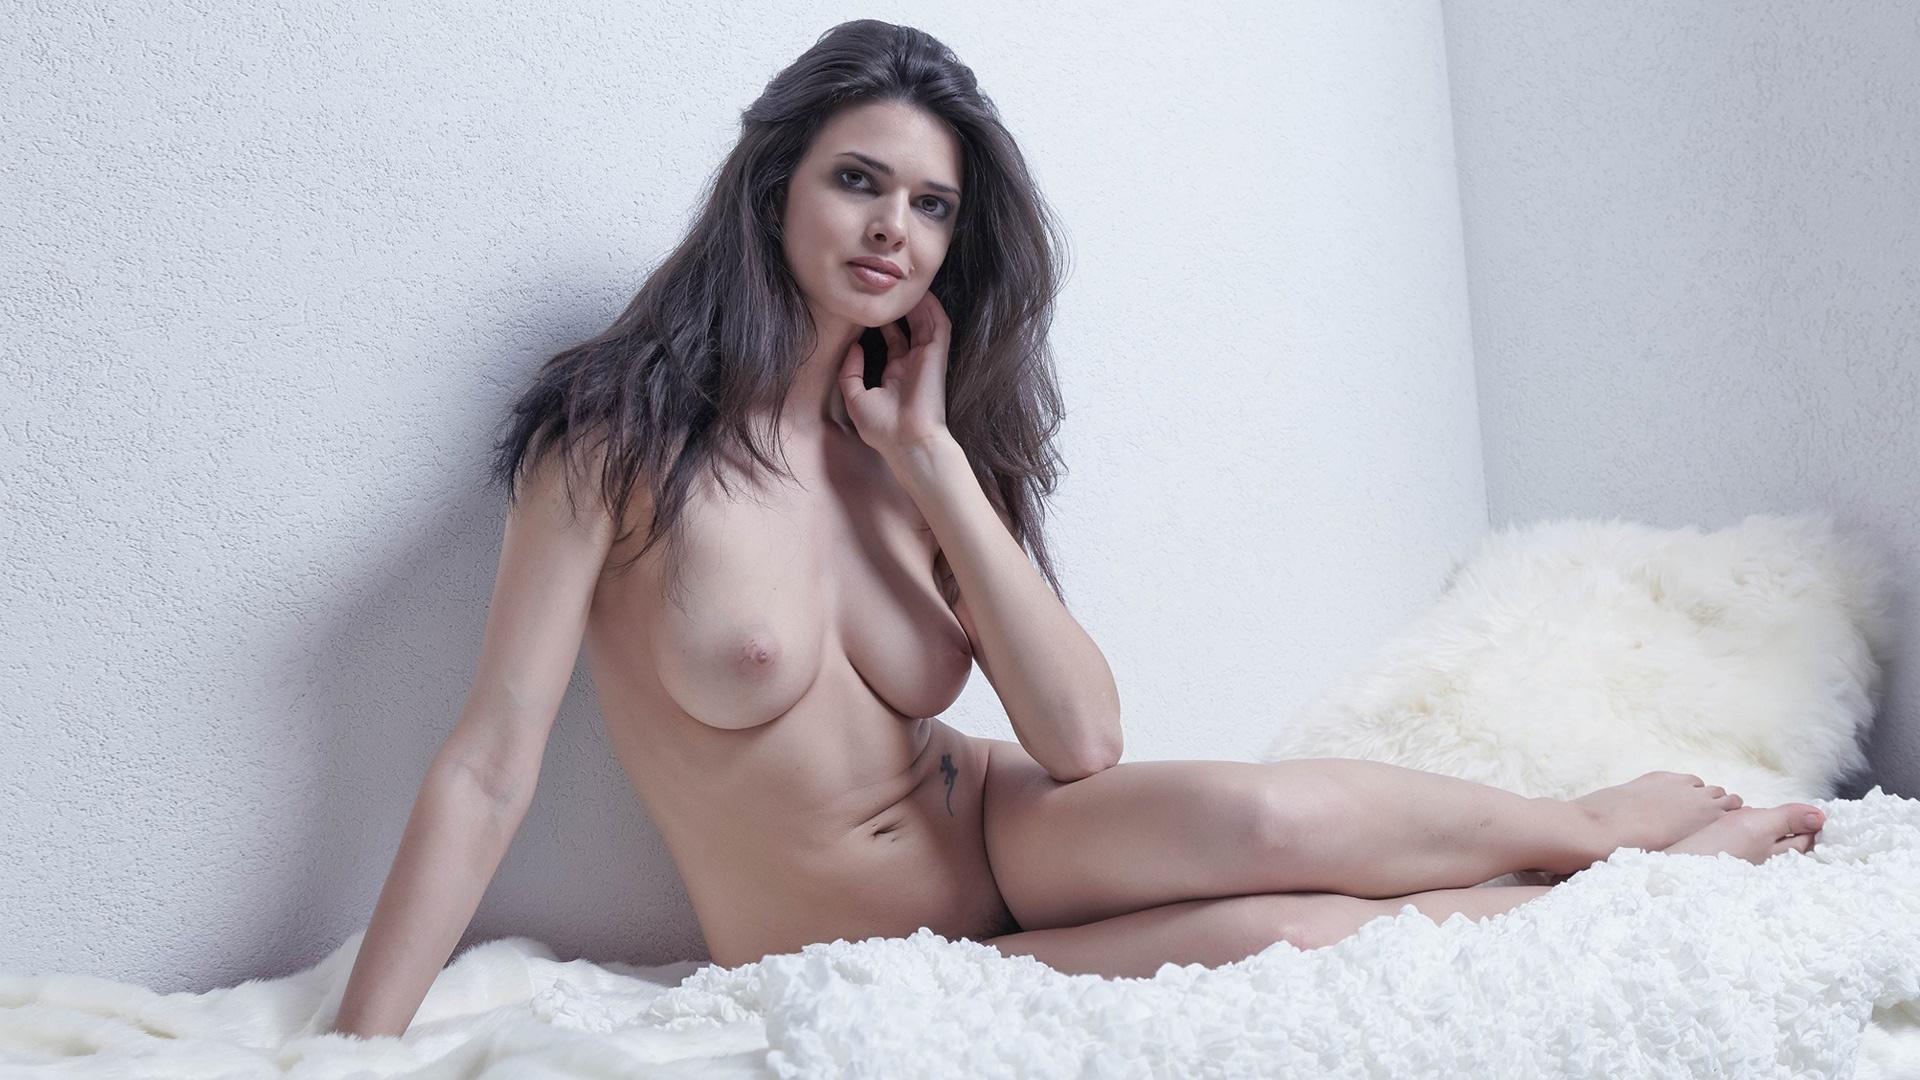 sweet body hd wallpaper 1920x1080 nude models and pornstars wallpapers